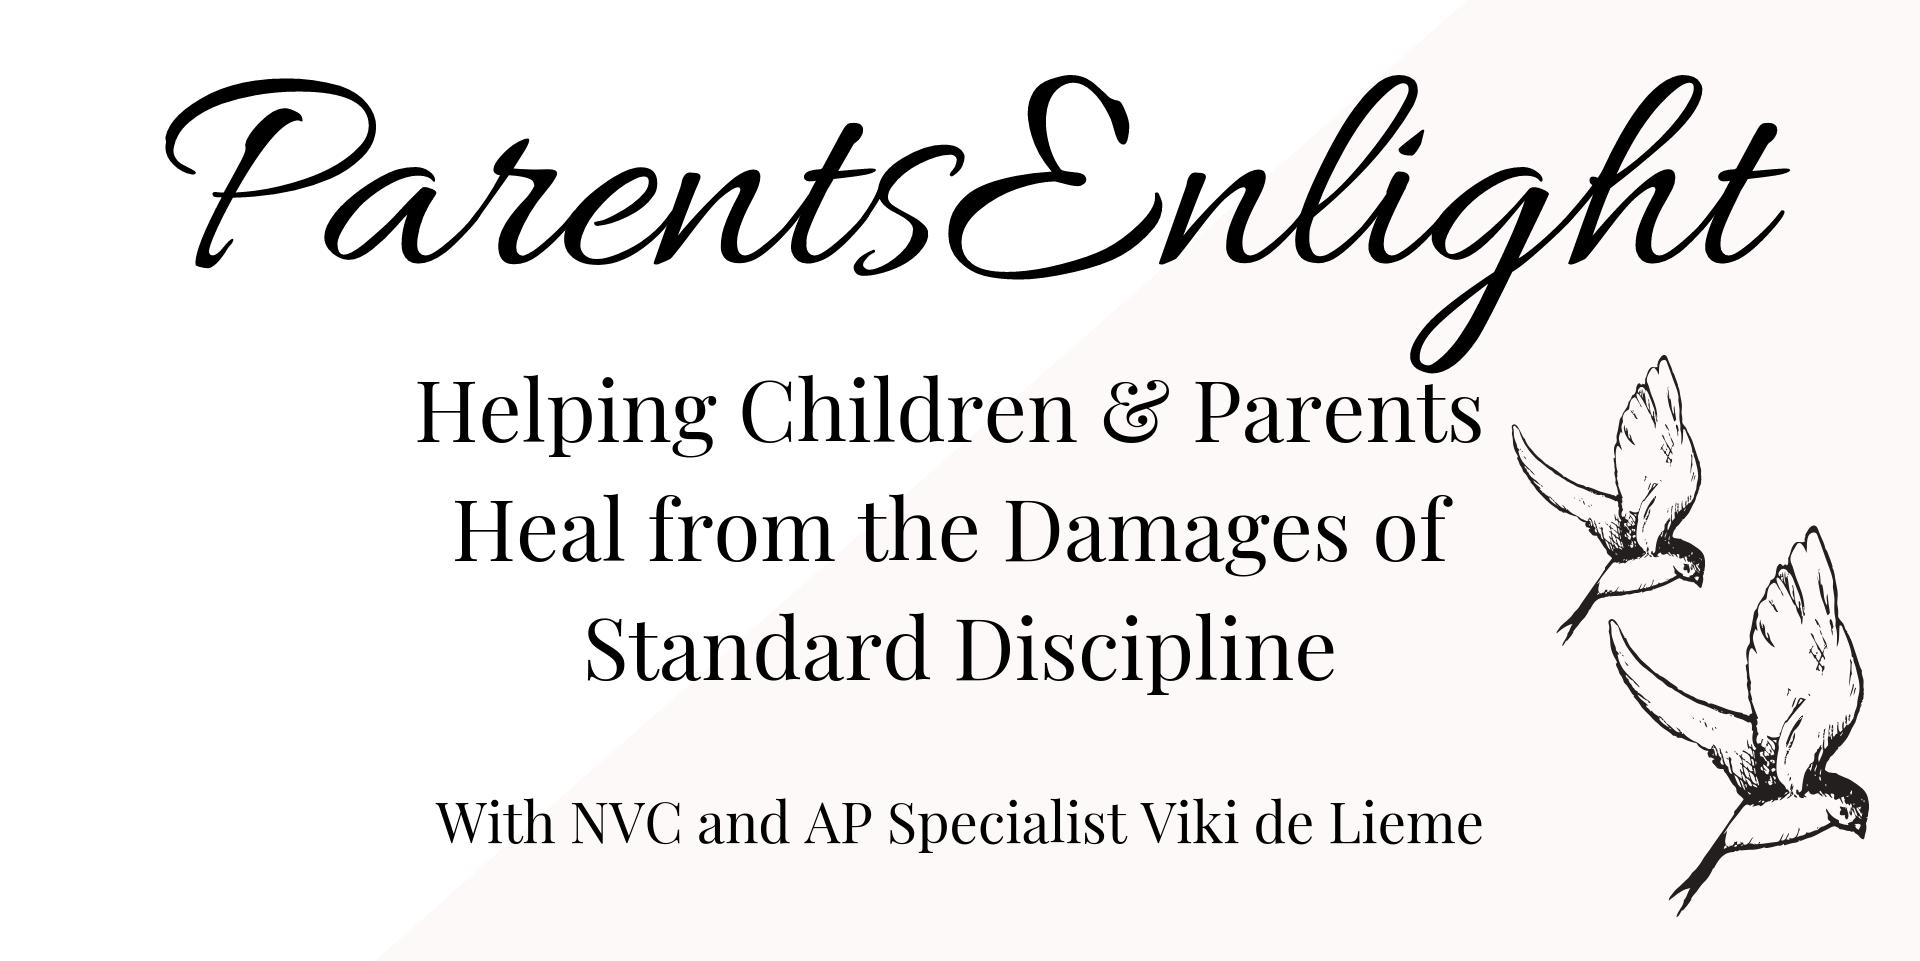 ParentsEnlight